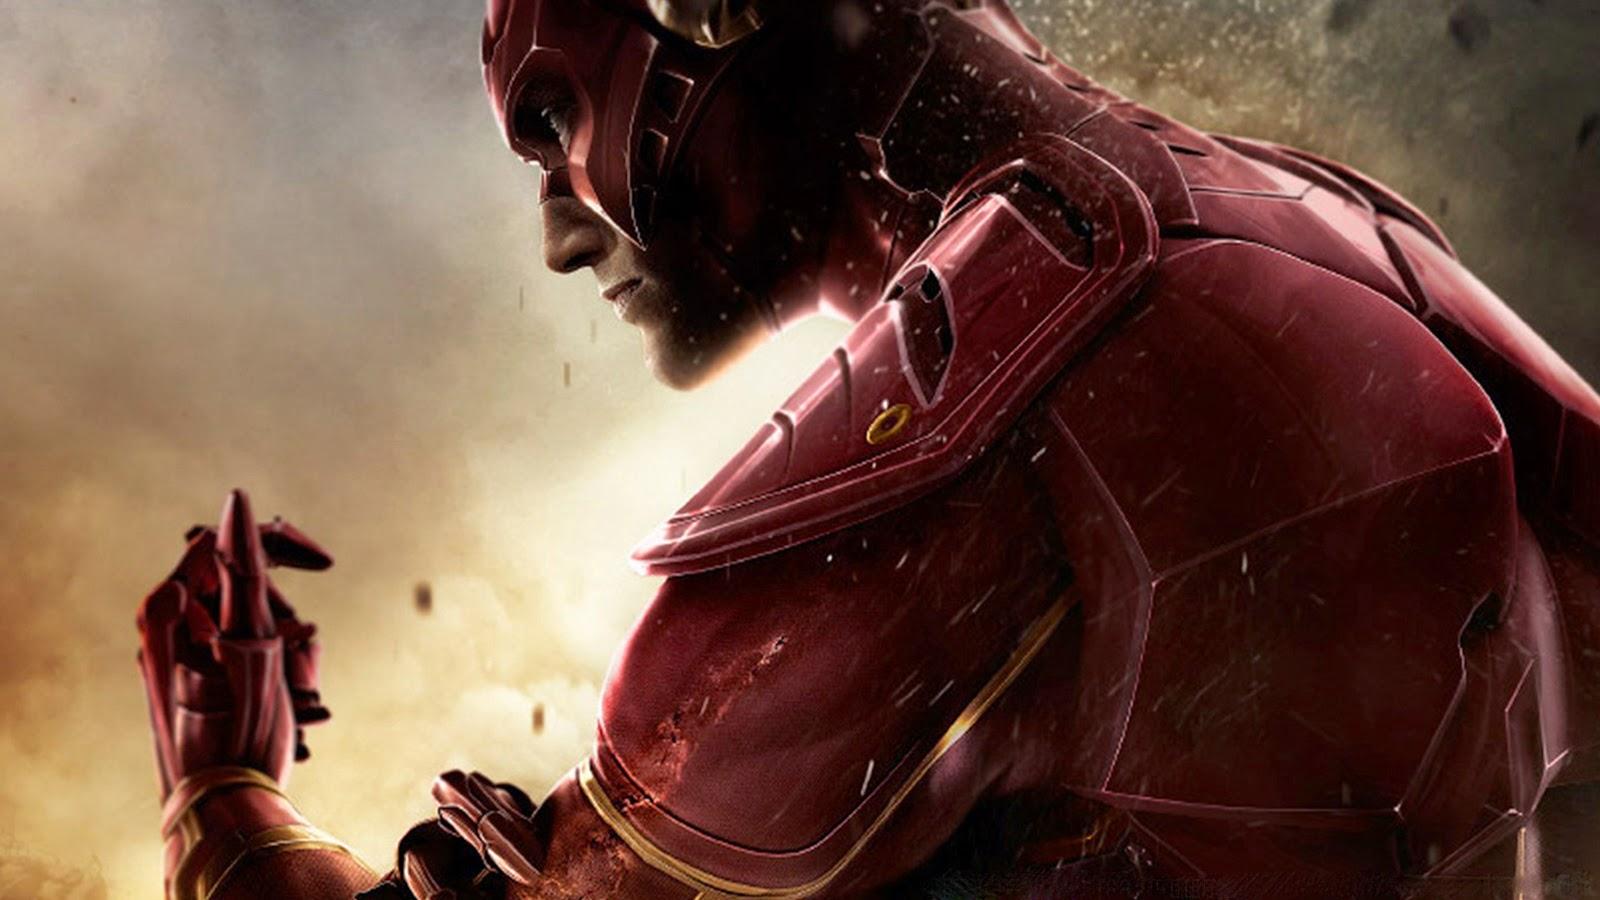 The Flash Wallpaper 1080p